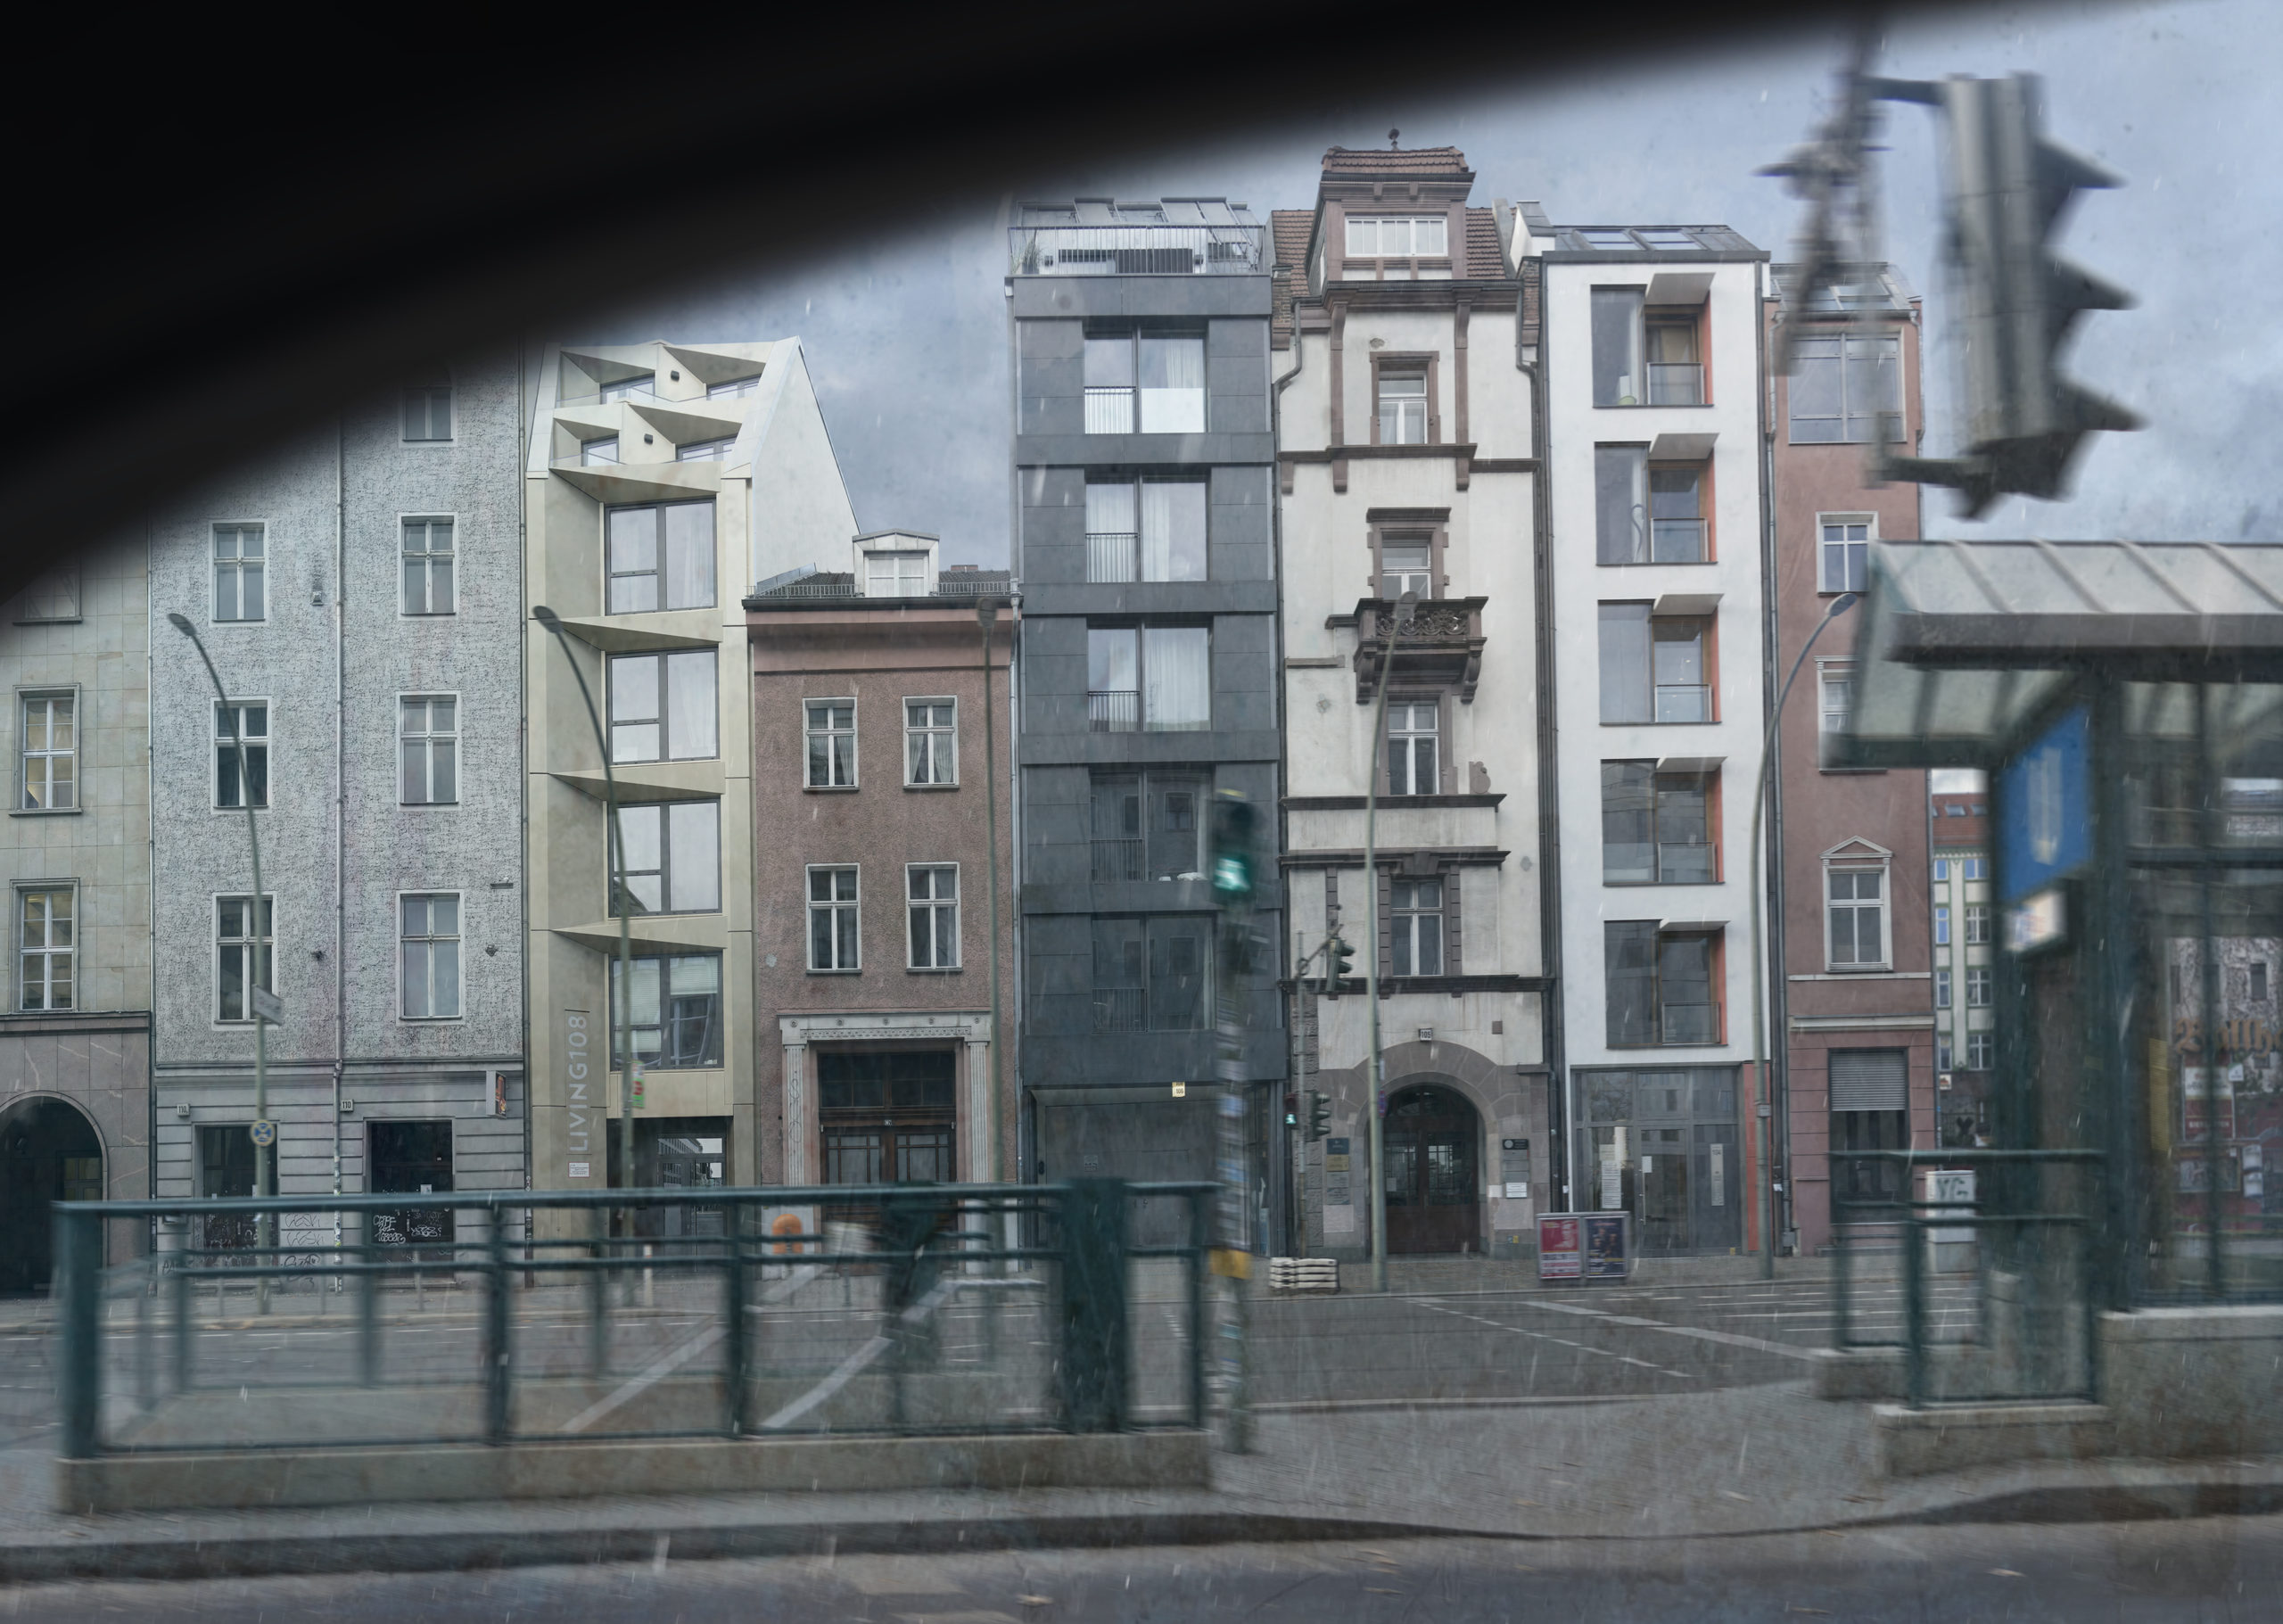 Dencity, Chauseestrasse, Berlin